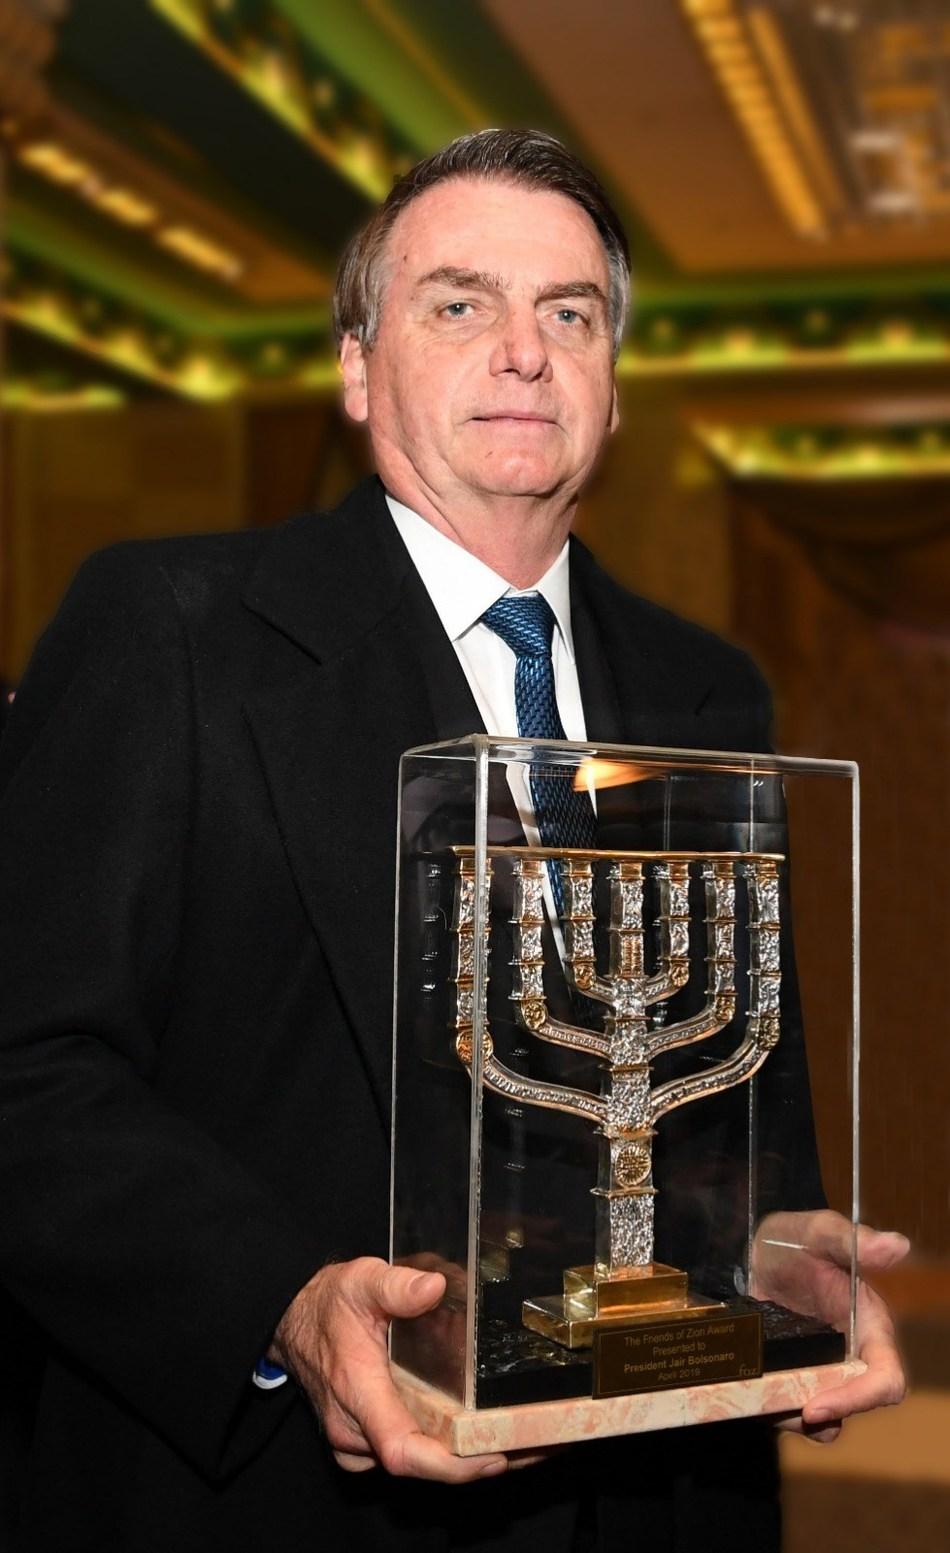 Brazilian President Bolsonaro Receives Friends of Zion Award, Photo Credit: Peter Halmagyi